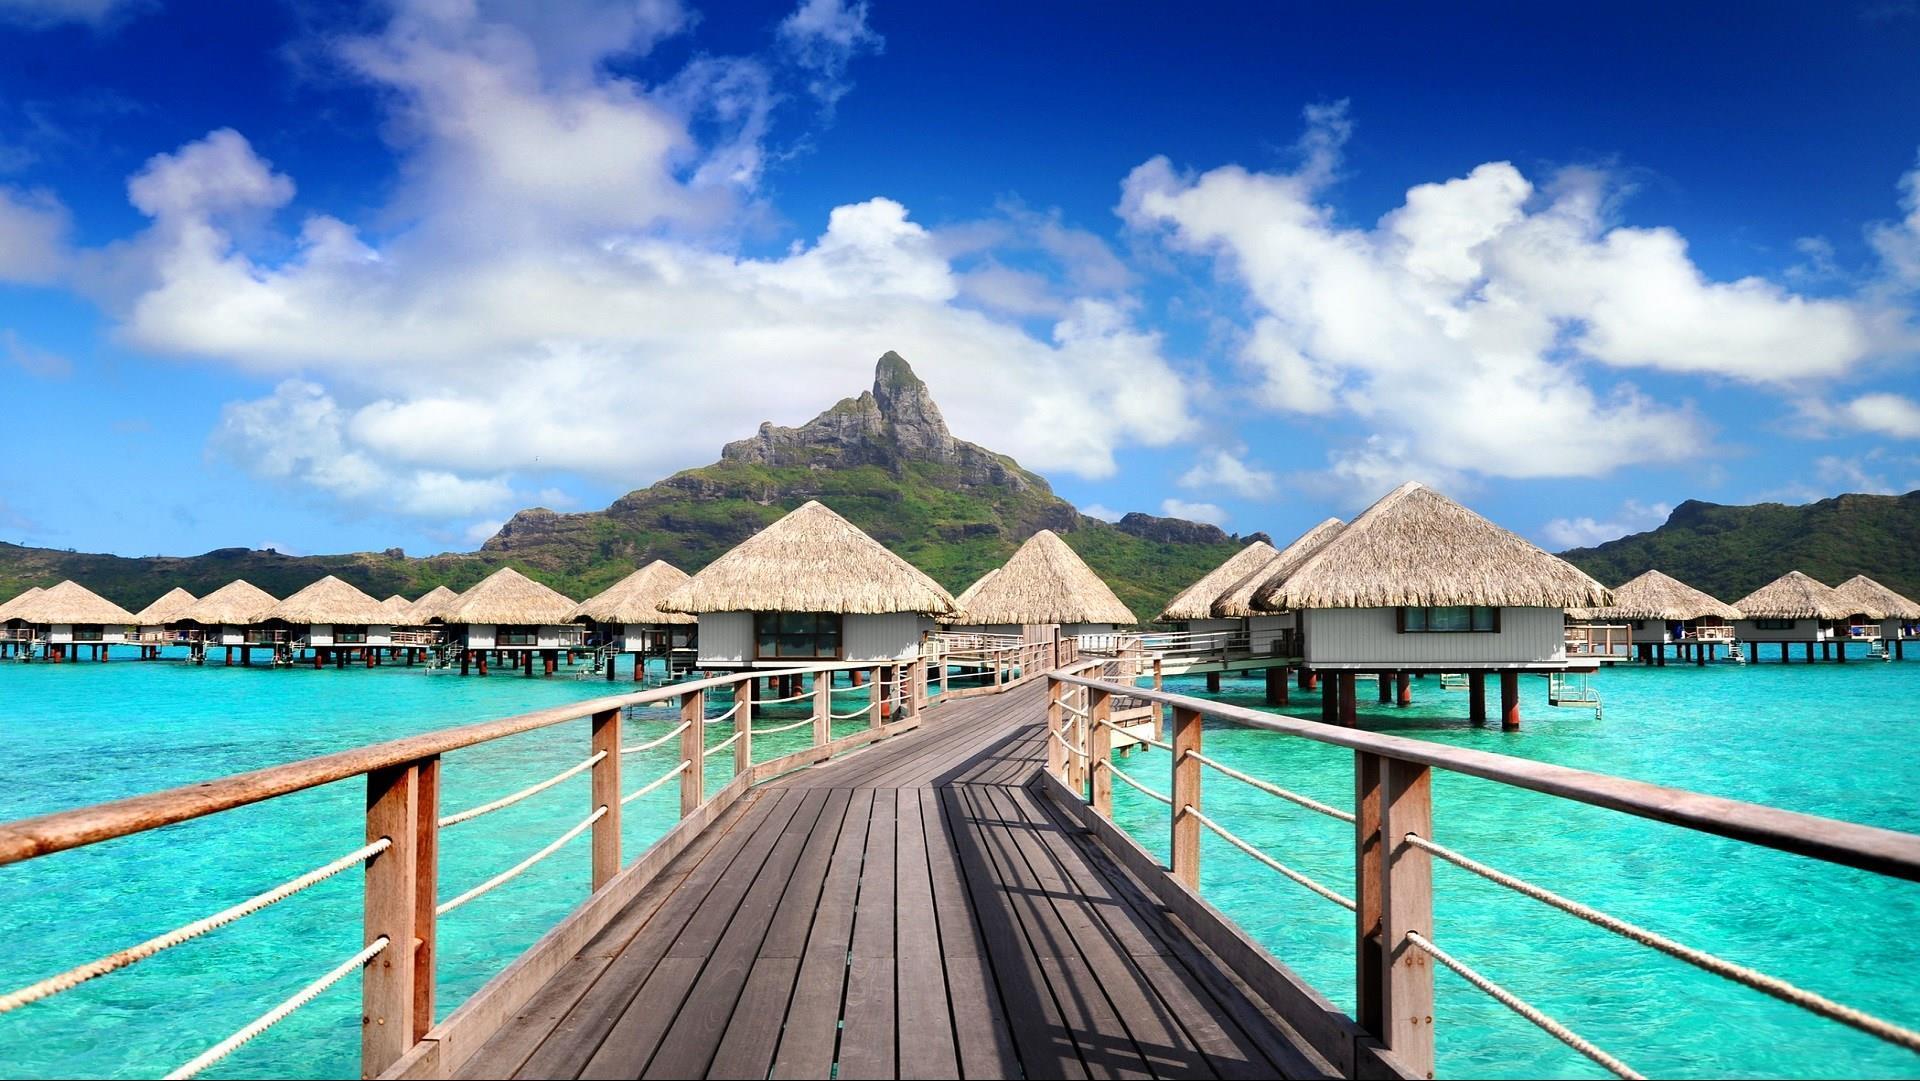 Meetings And Events At Le Meridien Bora Bora Bora Bora Pf